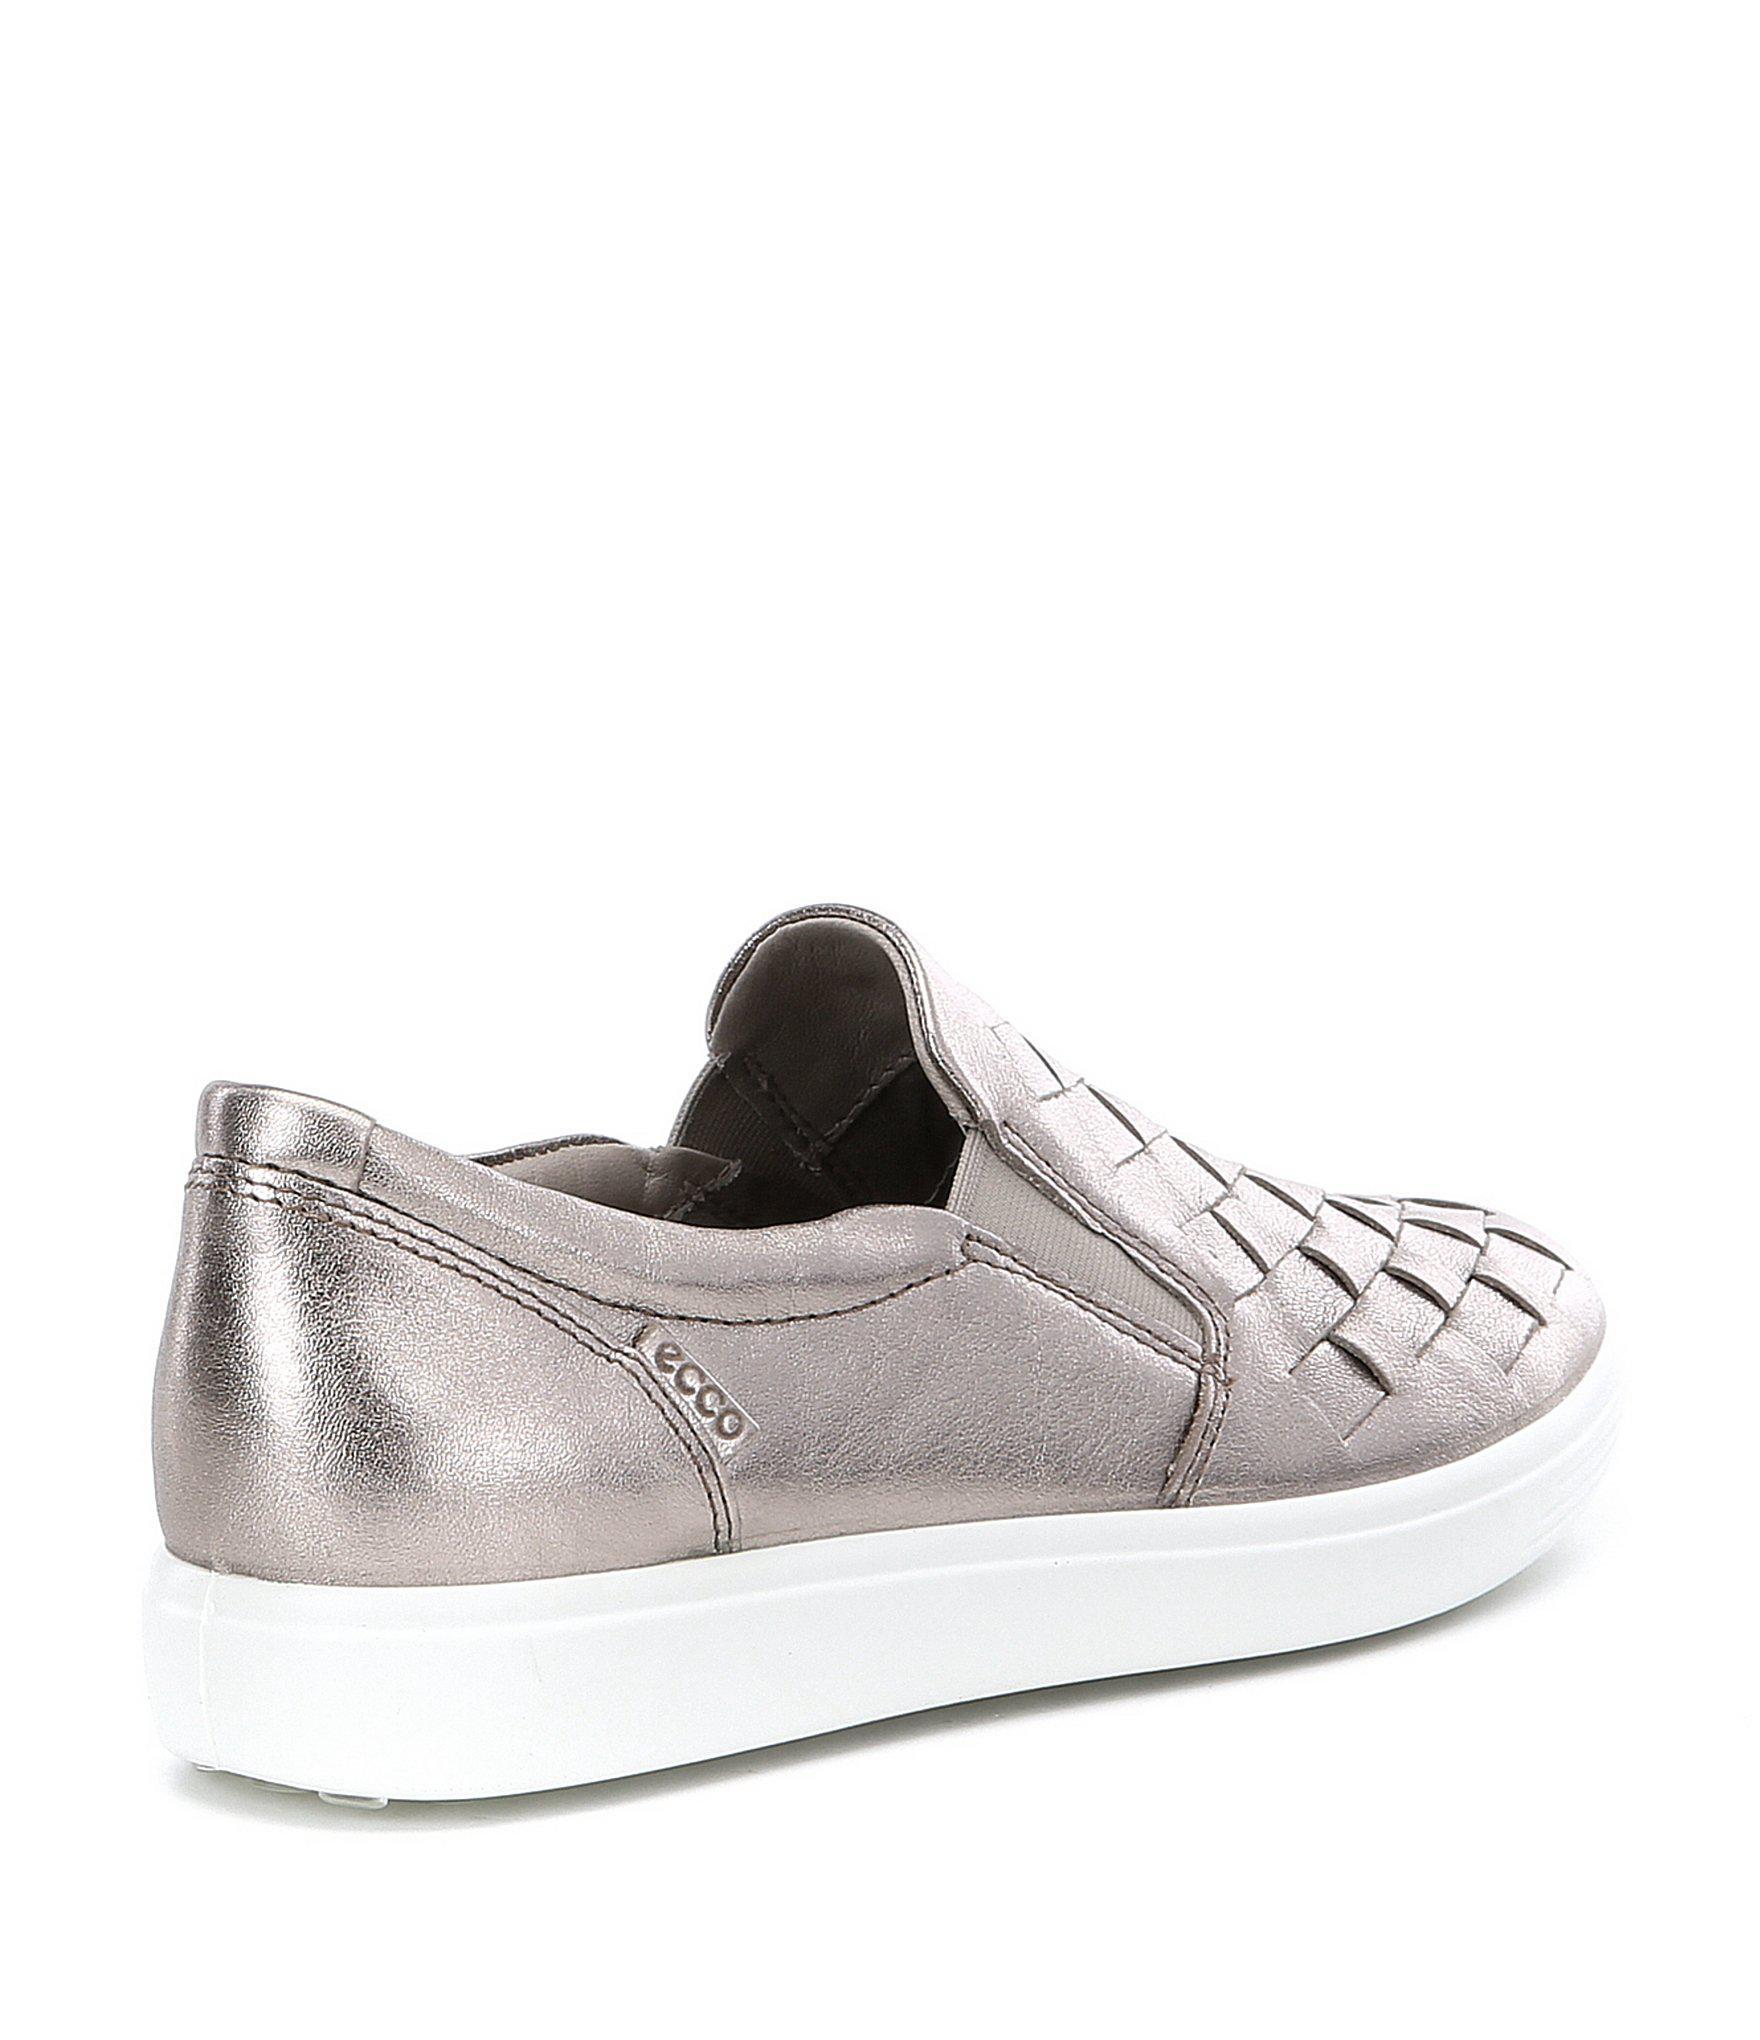 fbc91bd859f Ecco - Black Women s Soft 7 Woven Slip-on Sneakers - Lyst. View fullscreen